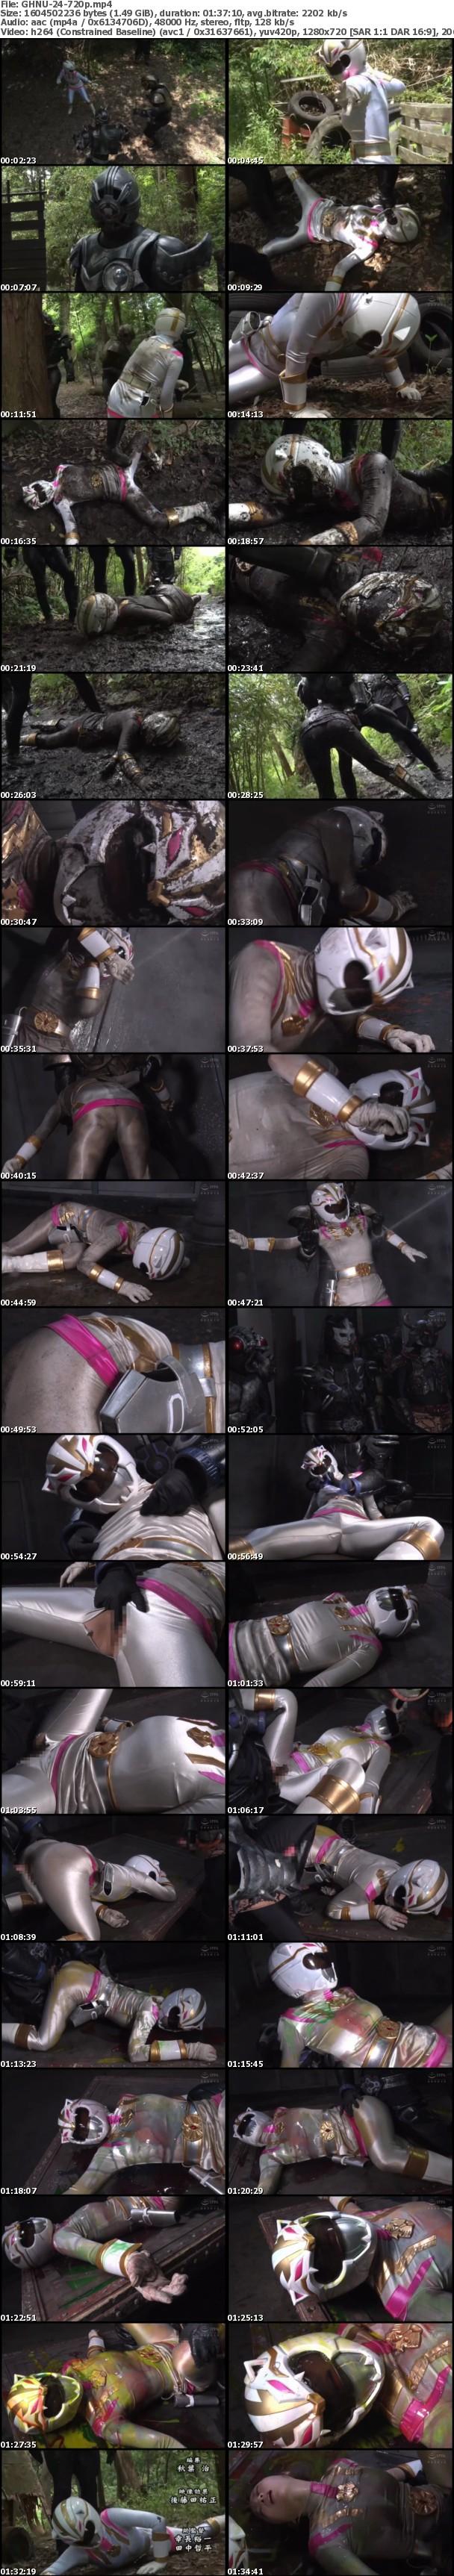 (HD) GHNU-24 ヒロインウェット&メッシー ドロドロビチョビチョ汚辱 強獣戦隊ワイルドレンジャー 生贄にされたワイルドホワイト 妃月るい